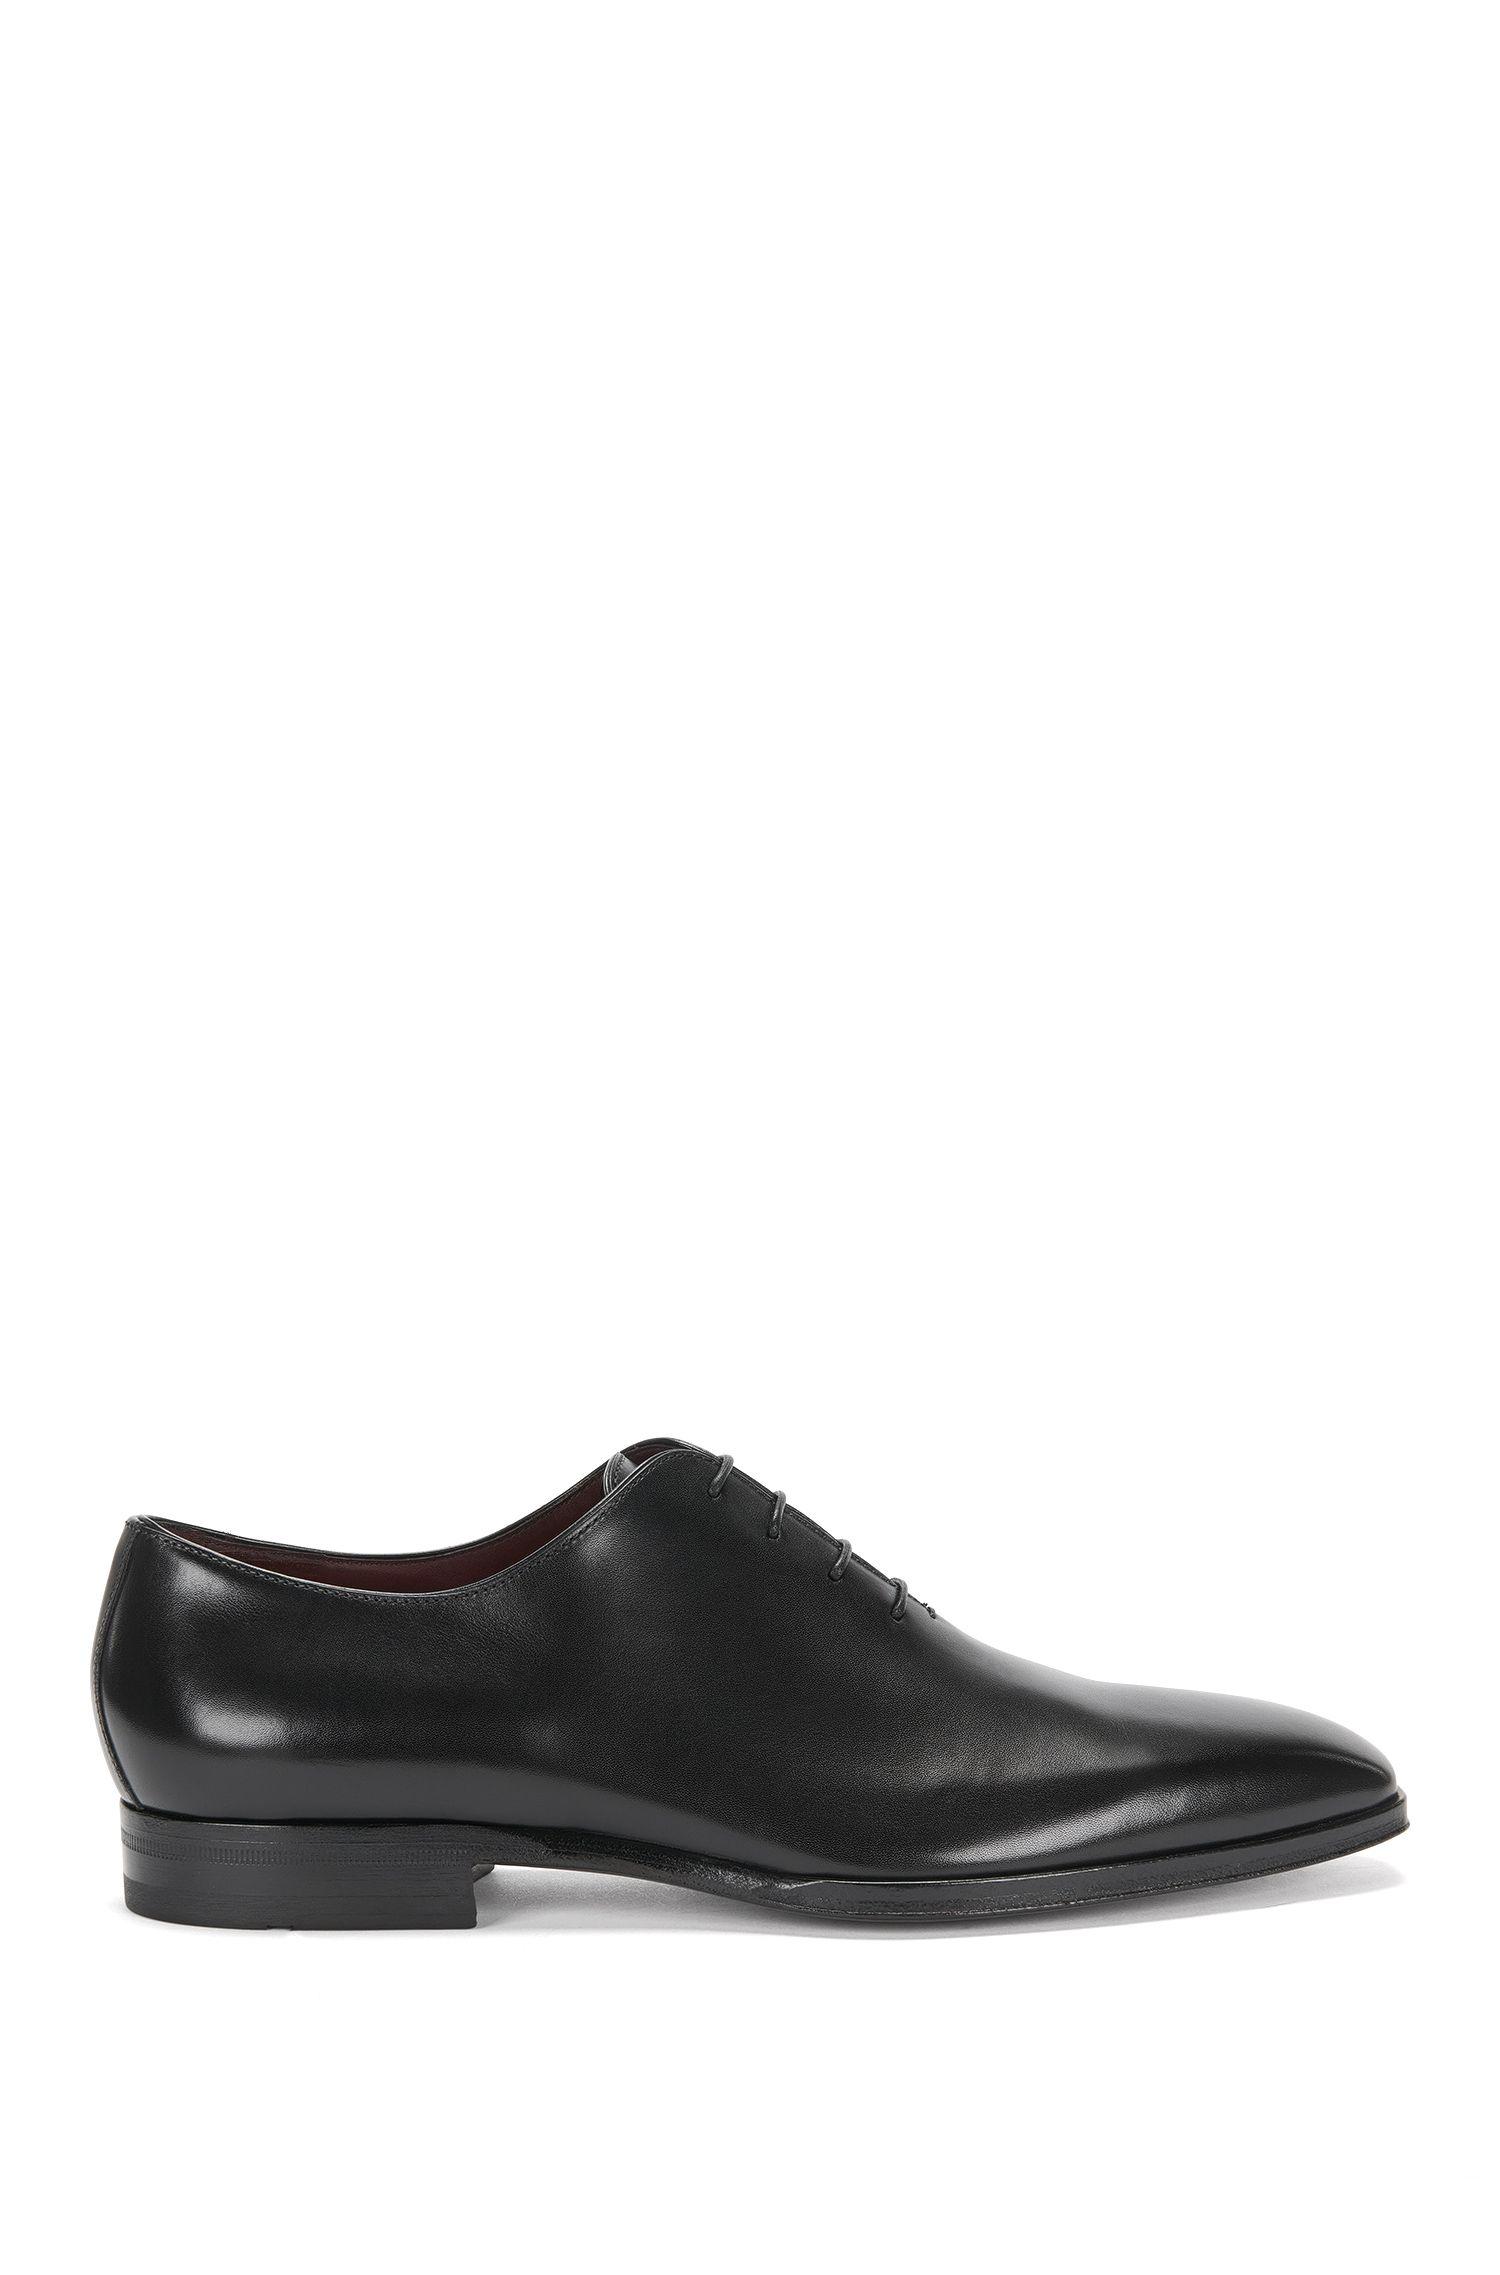 Chaussures Oxford BOSS Tailored en cuir poli